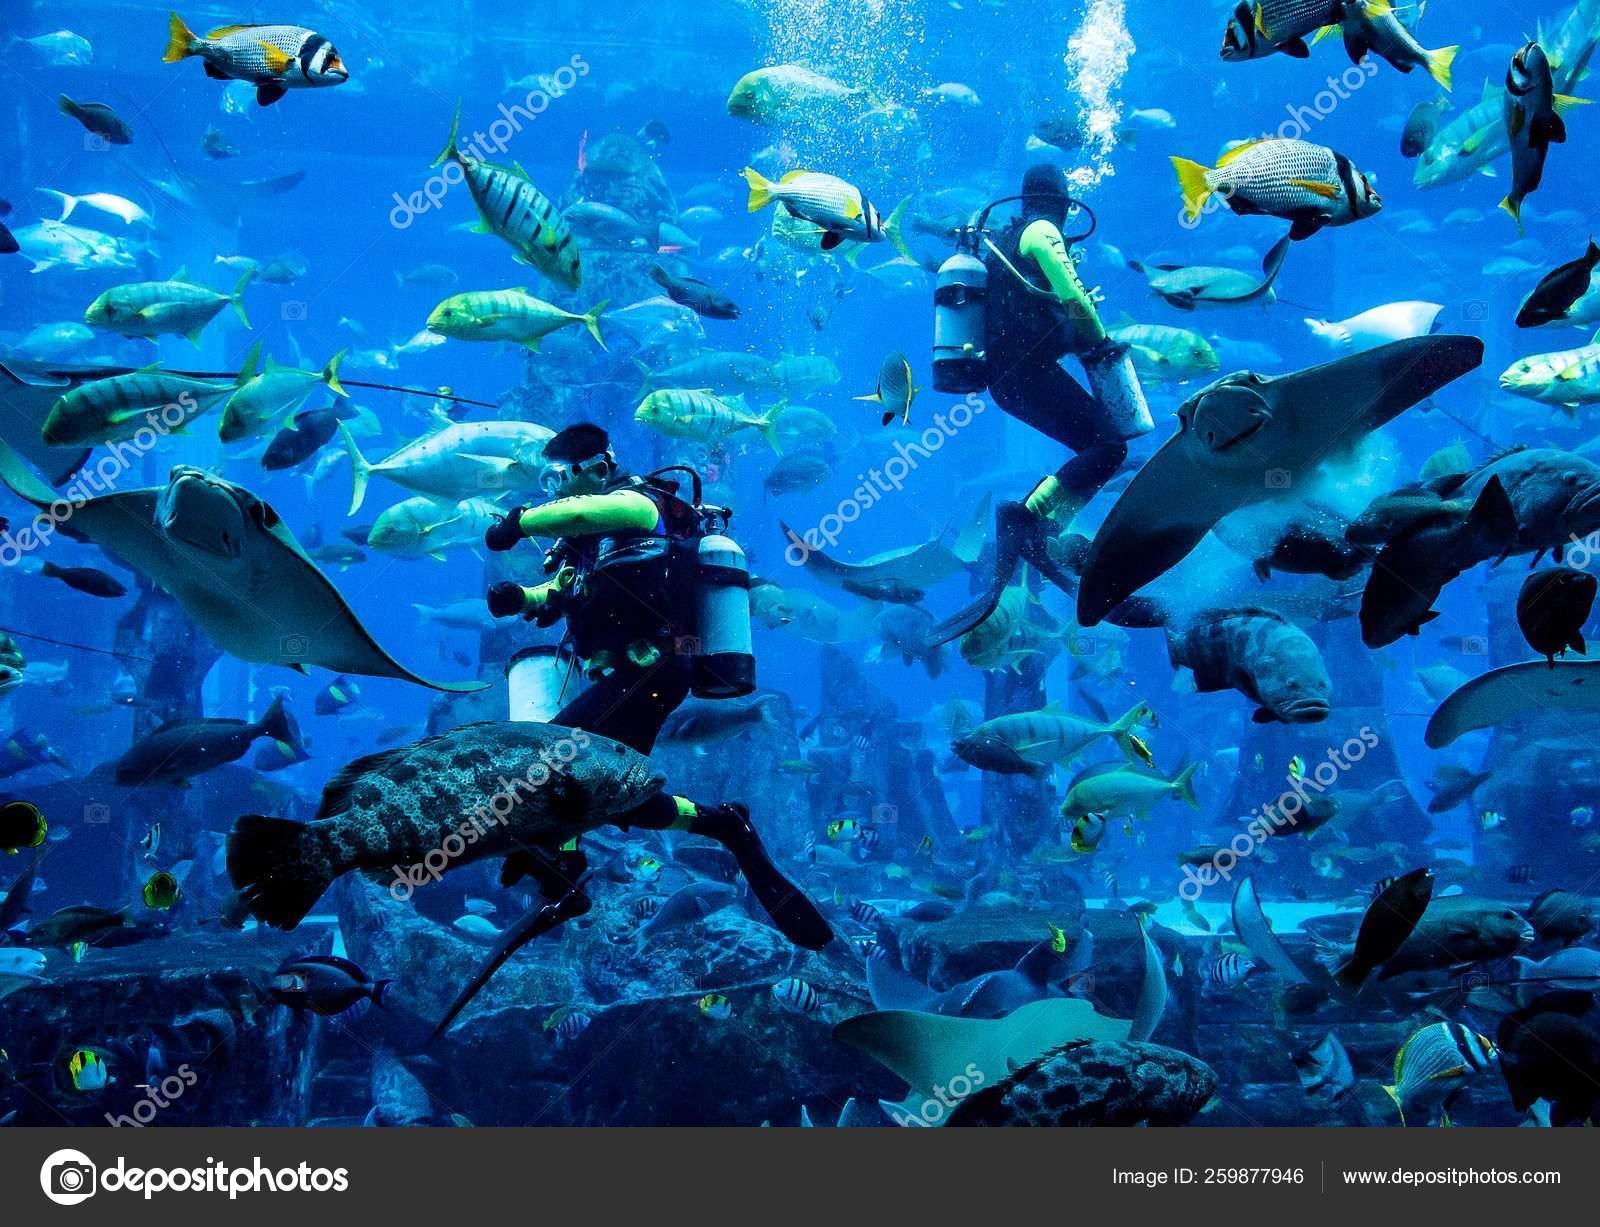 Dubai Uae November Huge Aquarium Hotel Atlantis Palm Islands Diver Stock Photo C Yayimages 259877946